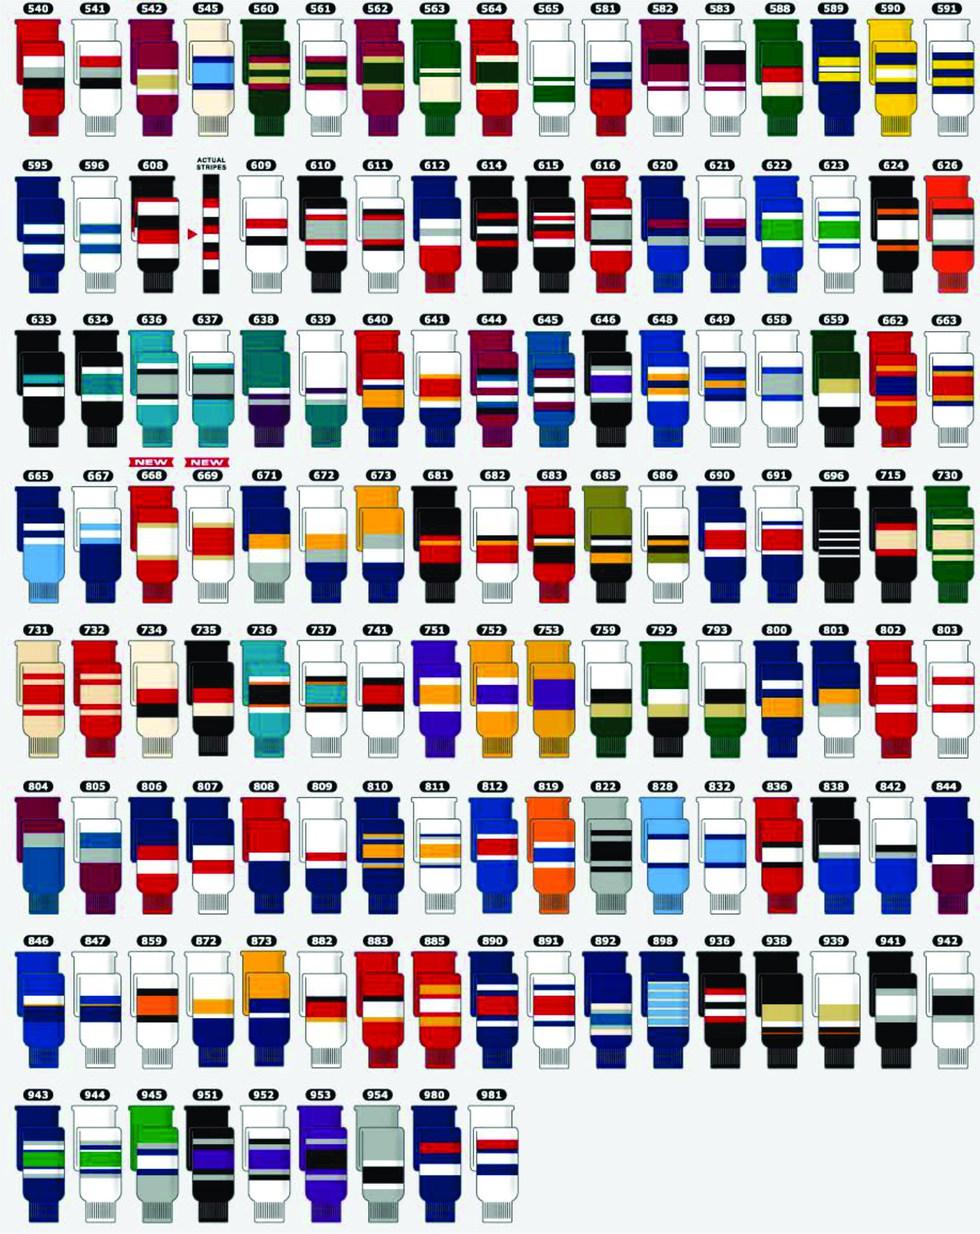 socks5_2048x2048.jpg